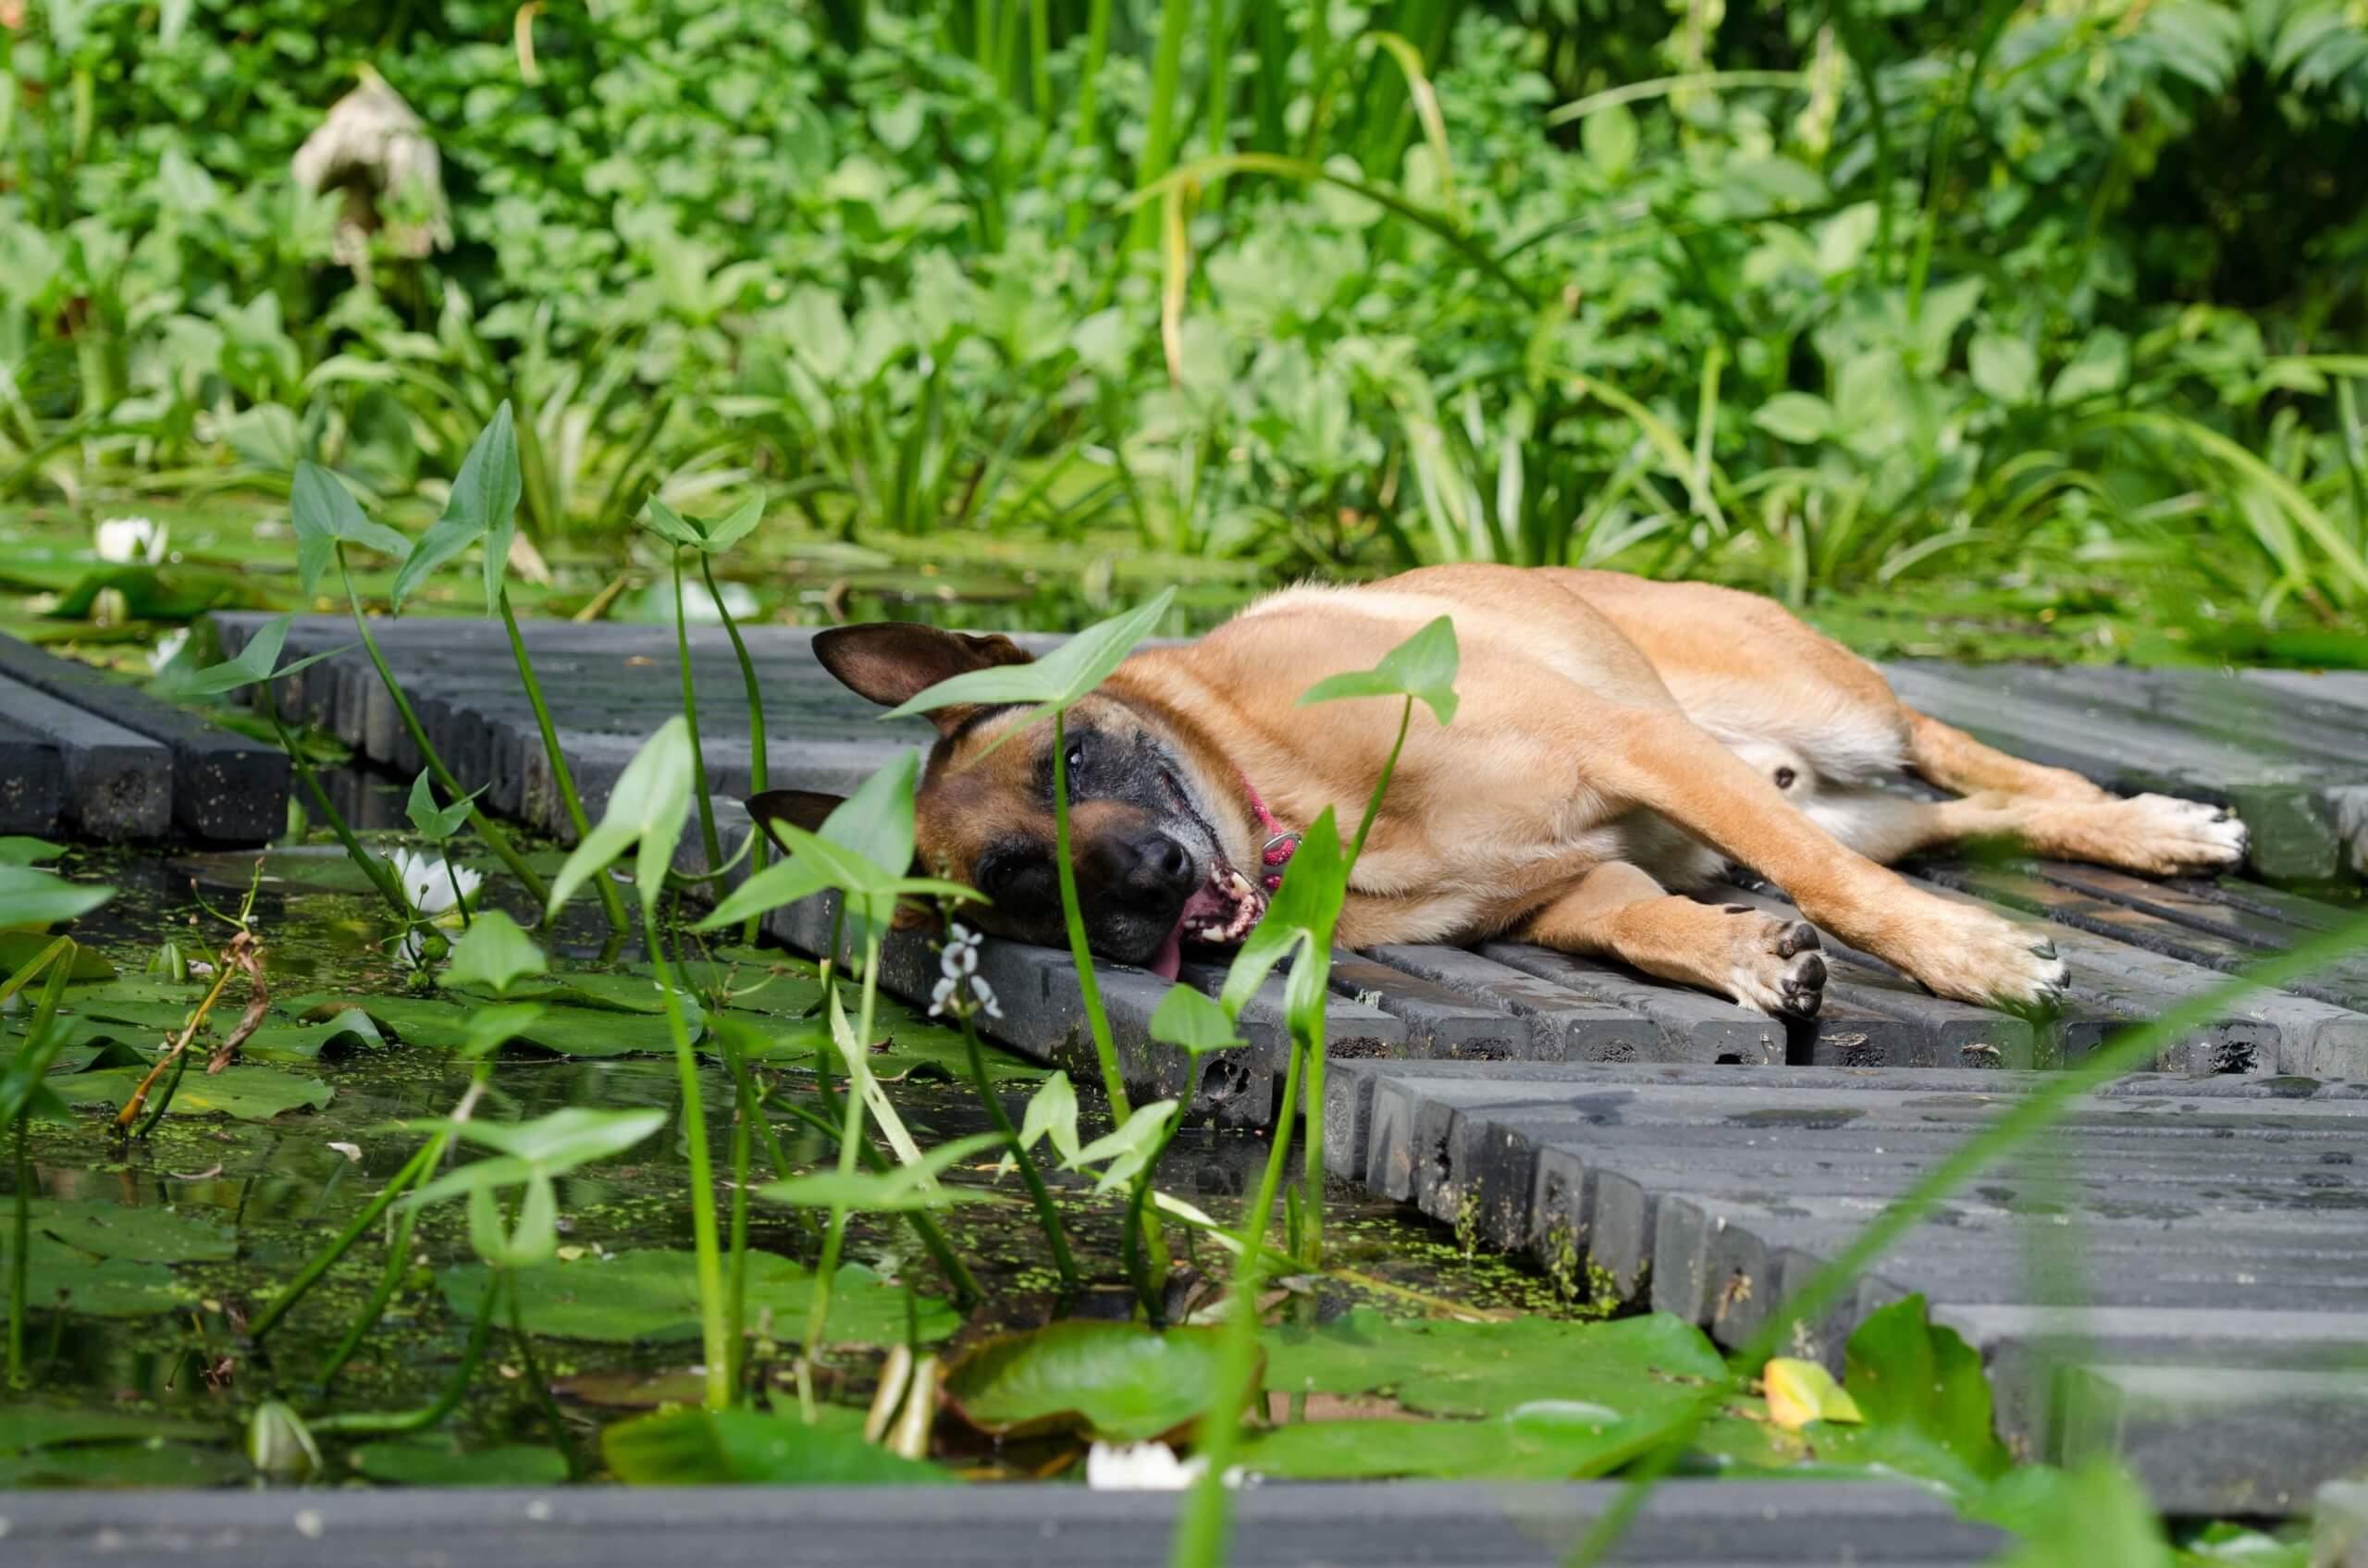 Pool Hund (c) 825545 pixabay.de